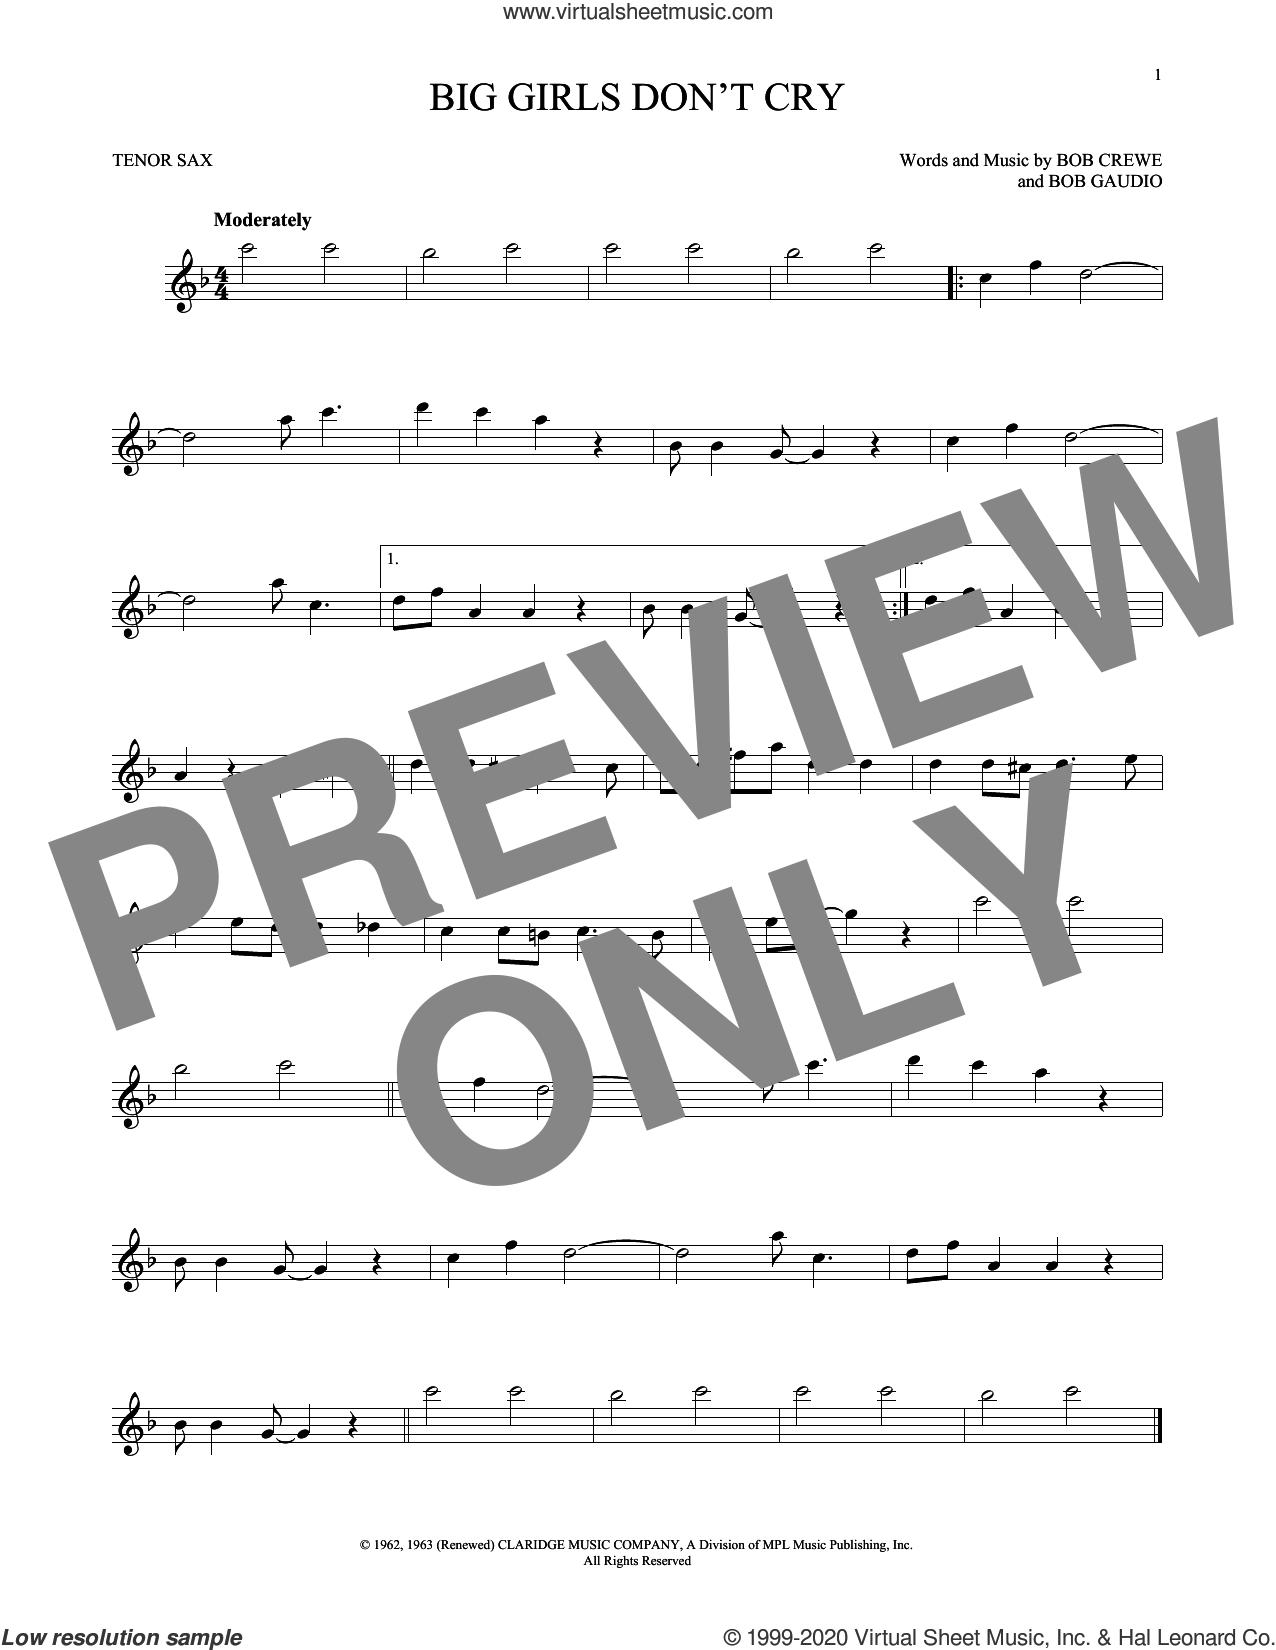 Big Girls Don't Cry sheet music for tenor saxophone solo by The Four Seasons, Bob Crewe and Bob Gaudio, intermediate skill level